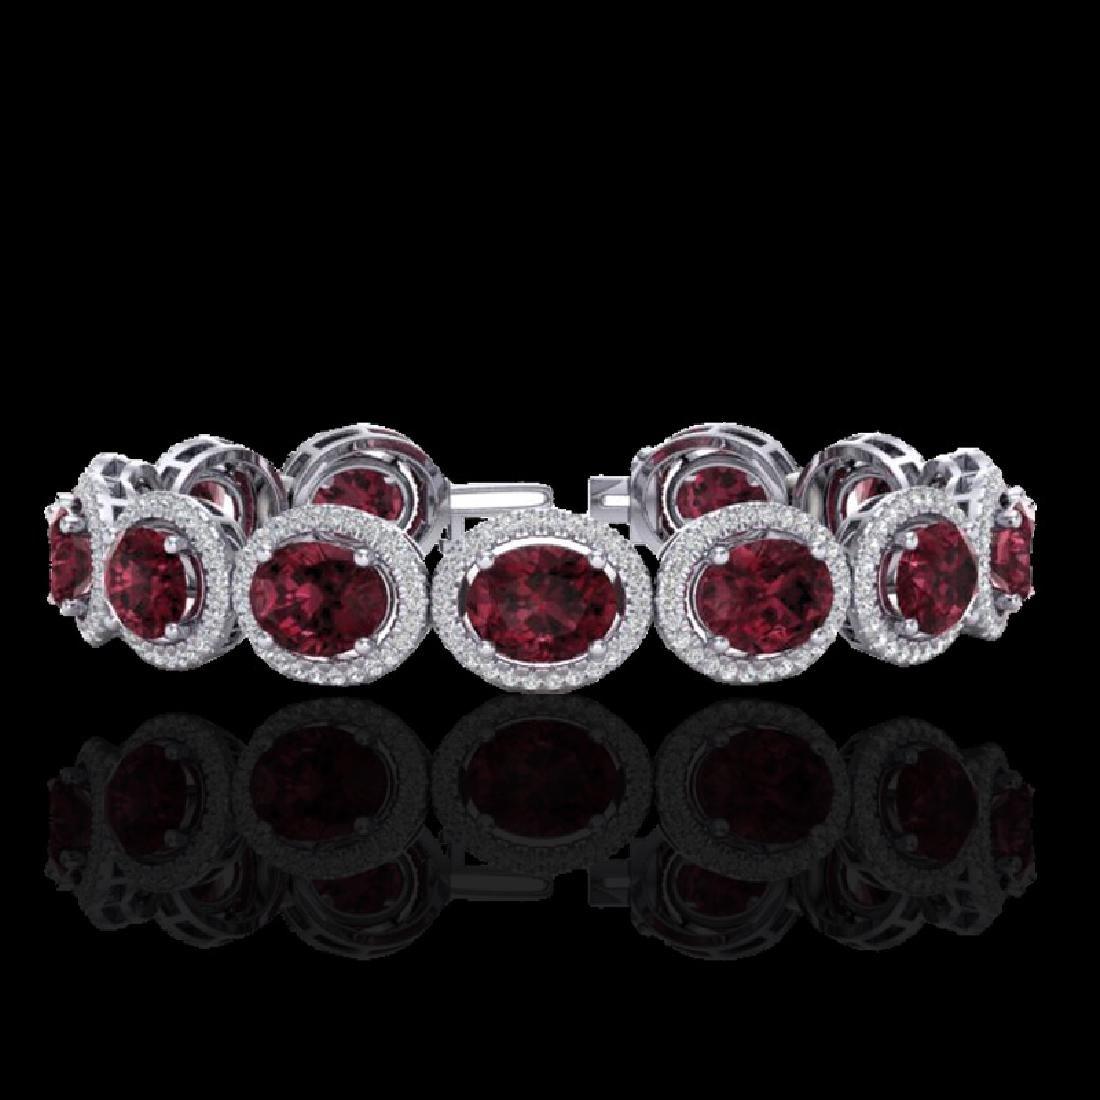 27 CTW Garnet & Micro Pave VS/SI Diamond Bracelet 10K